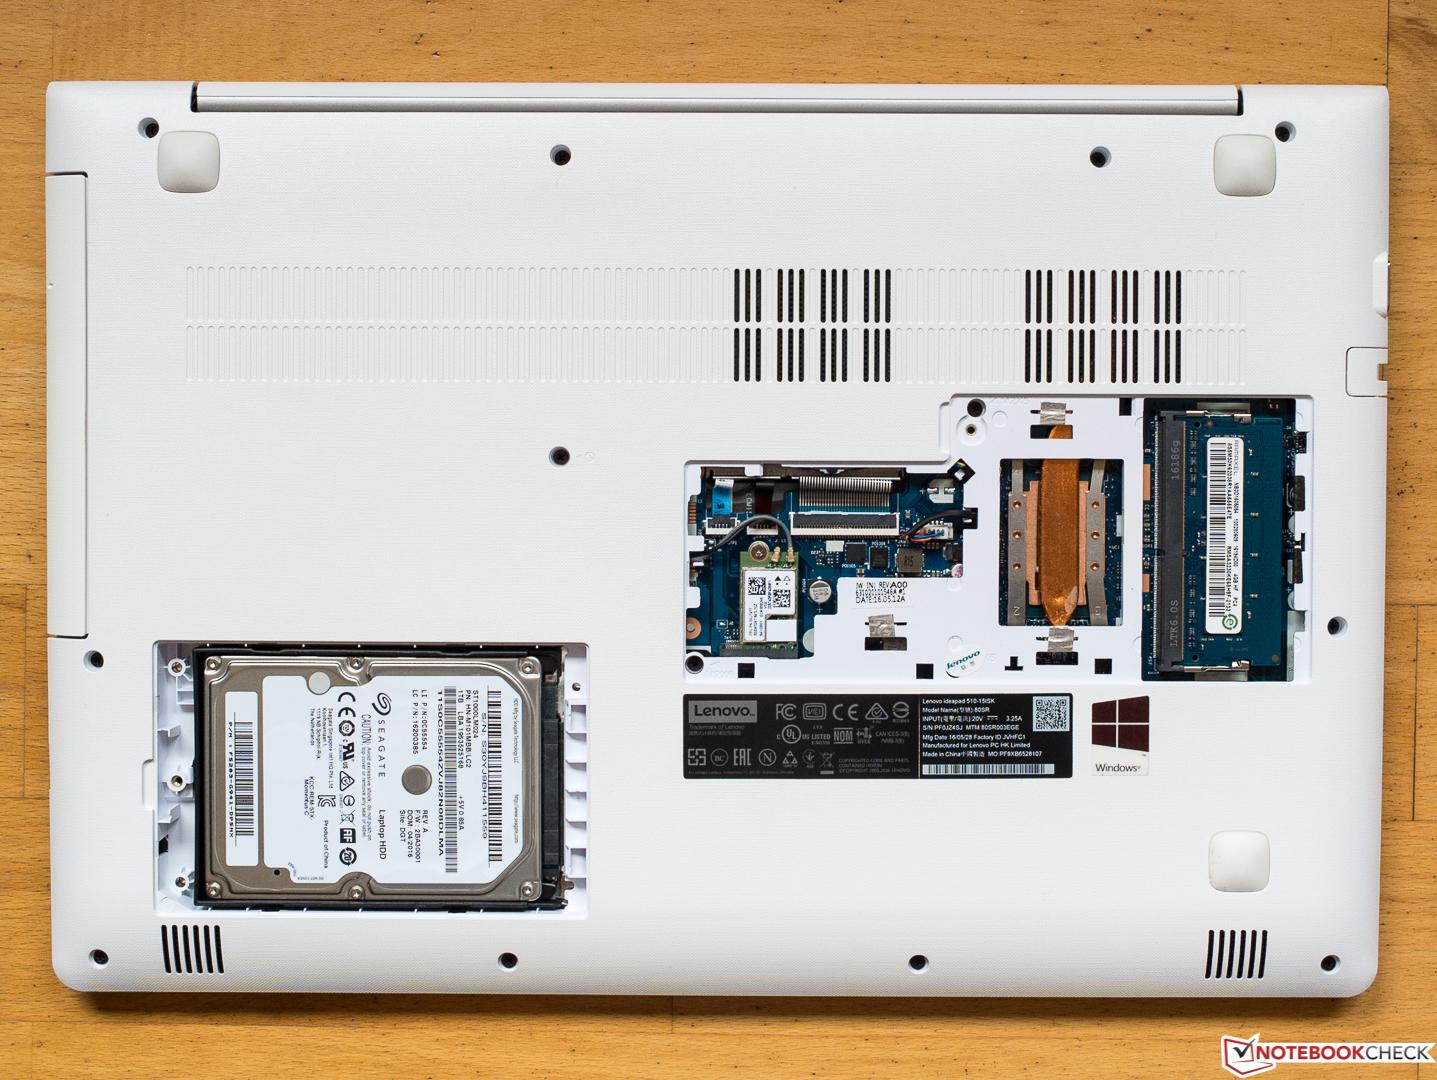 Lenovo E560 Disassembly